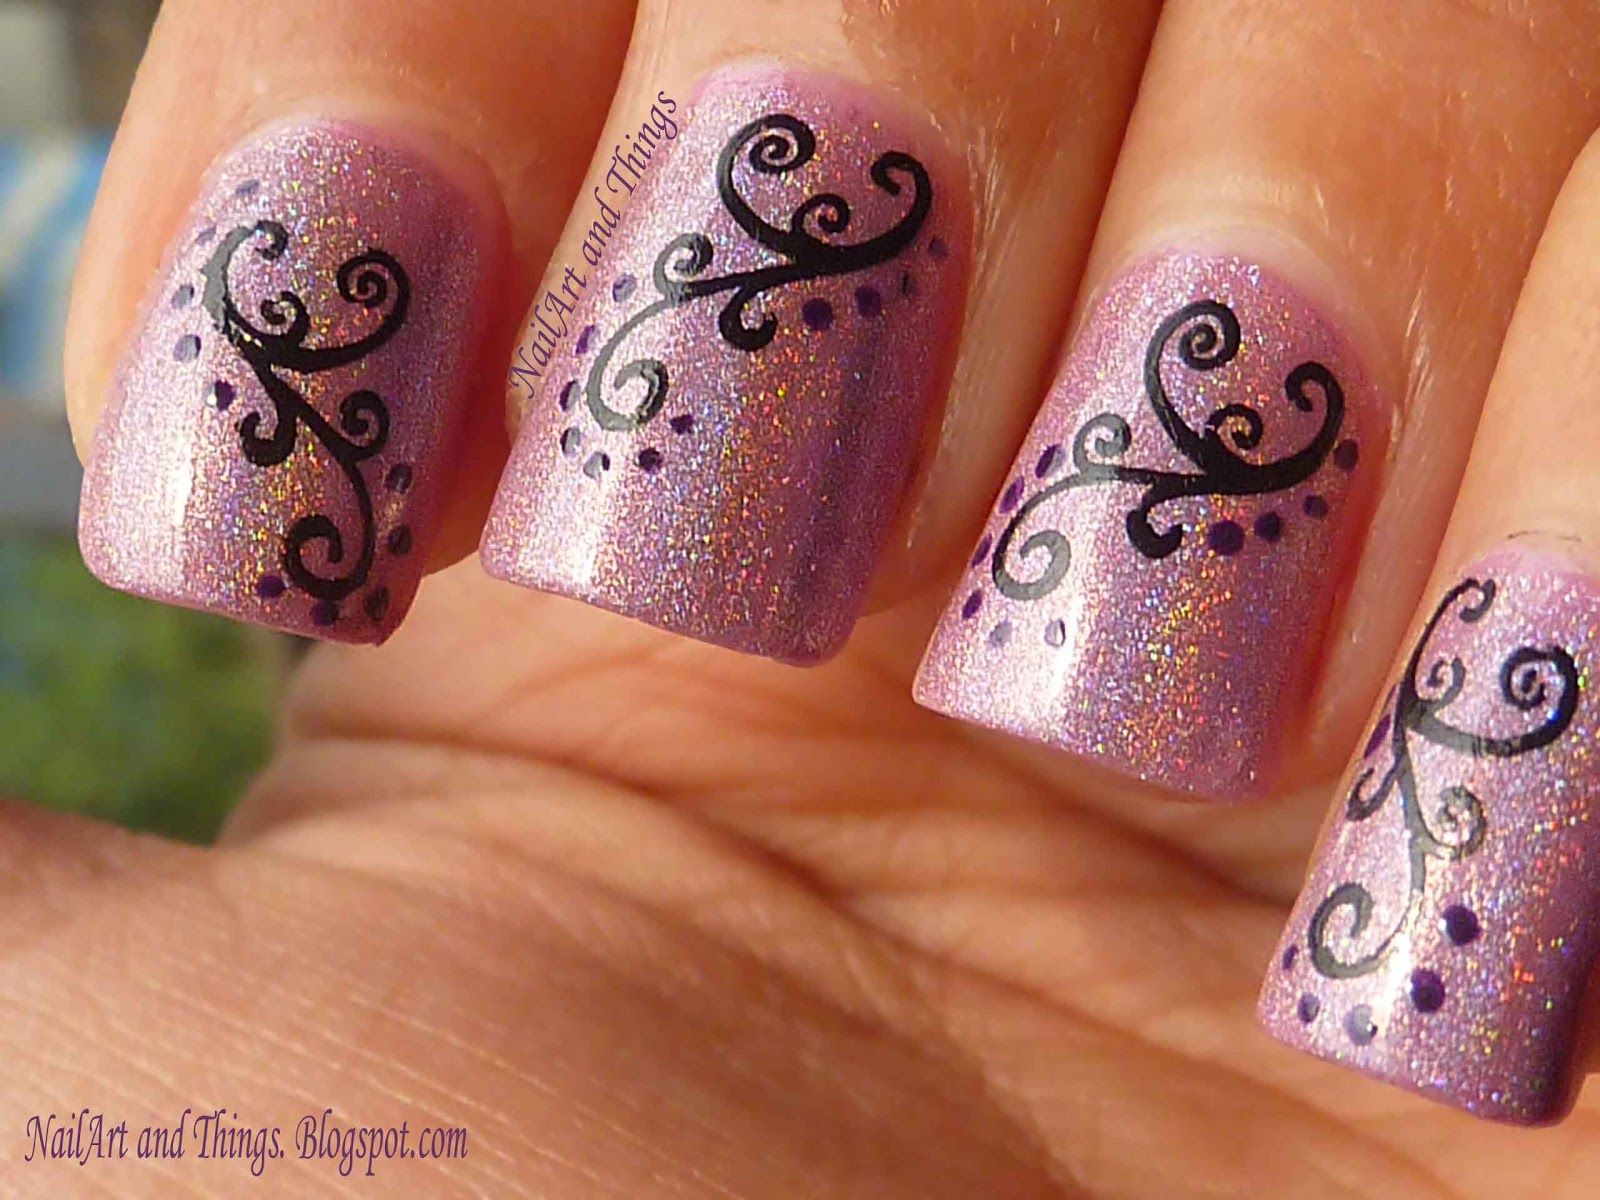 deepavali special nail arts designs in india google search. bridal ...